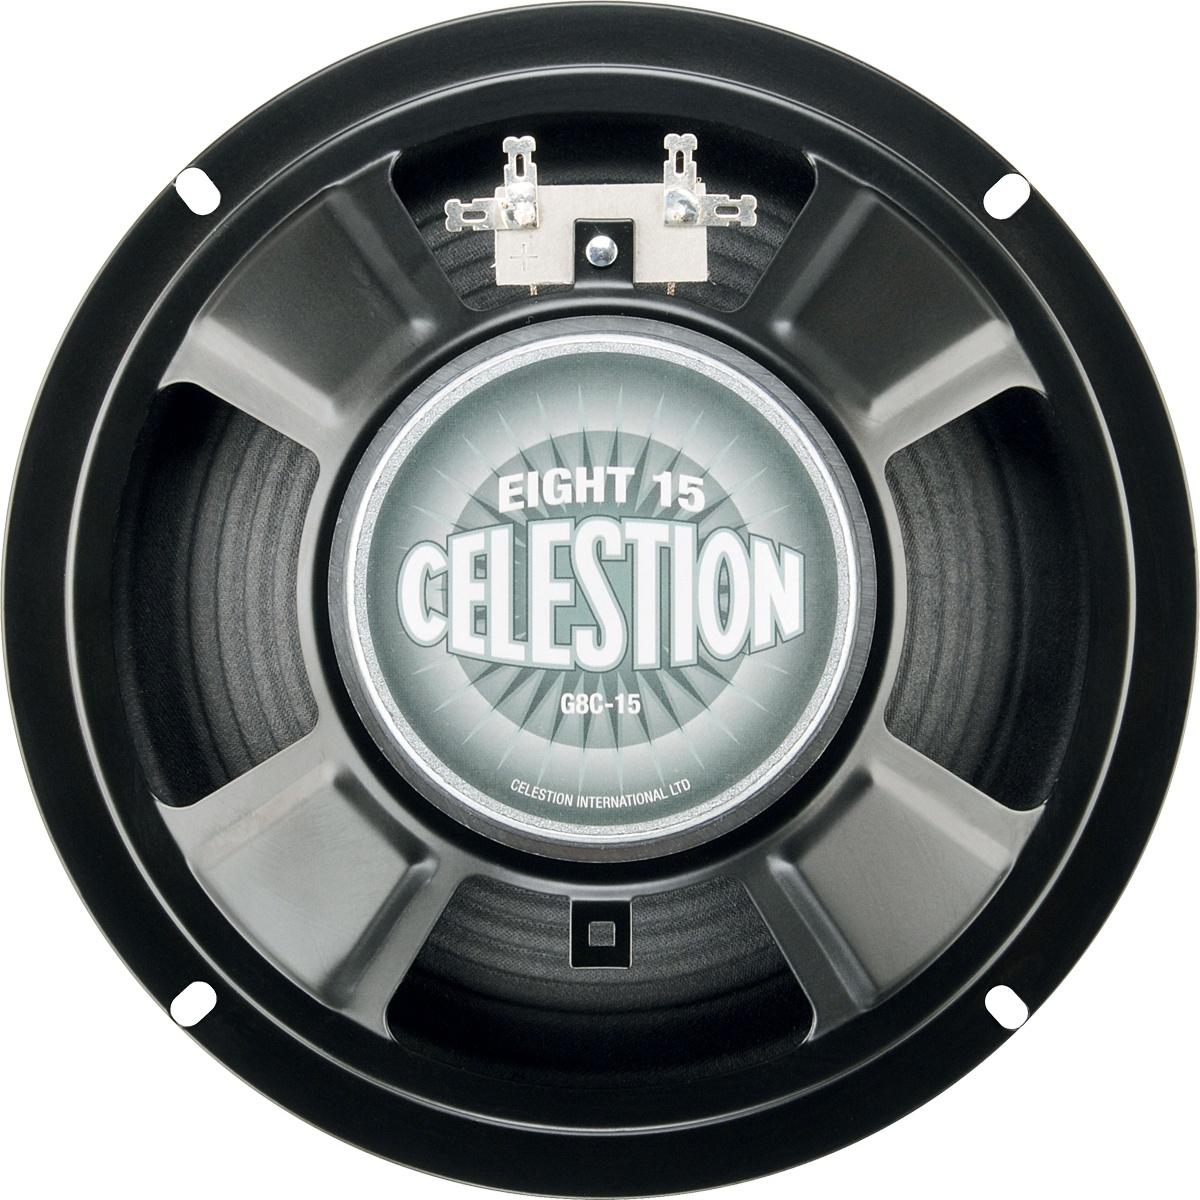 Celestion  Eight15-8